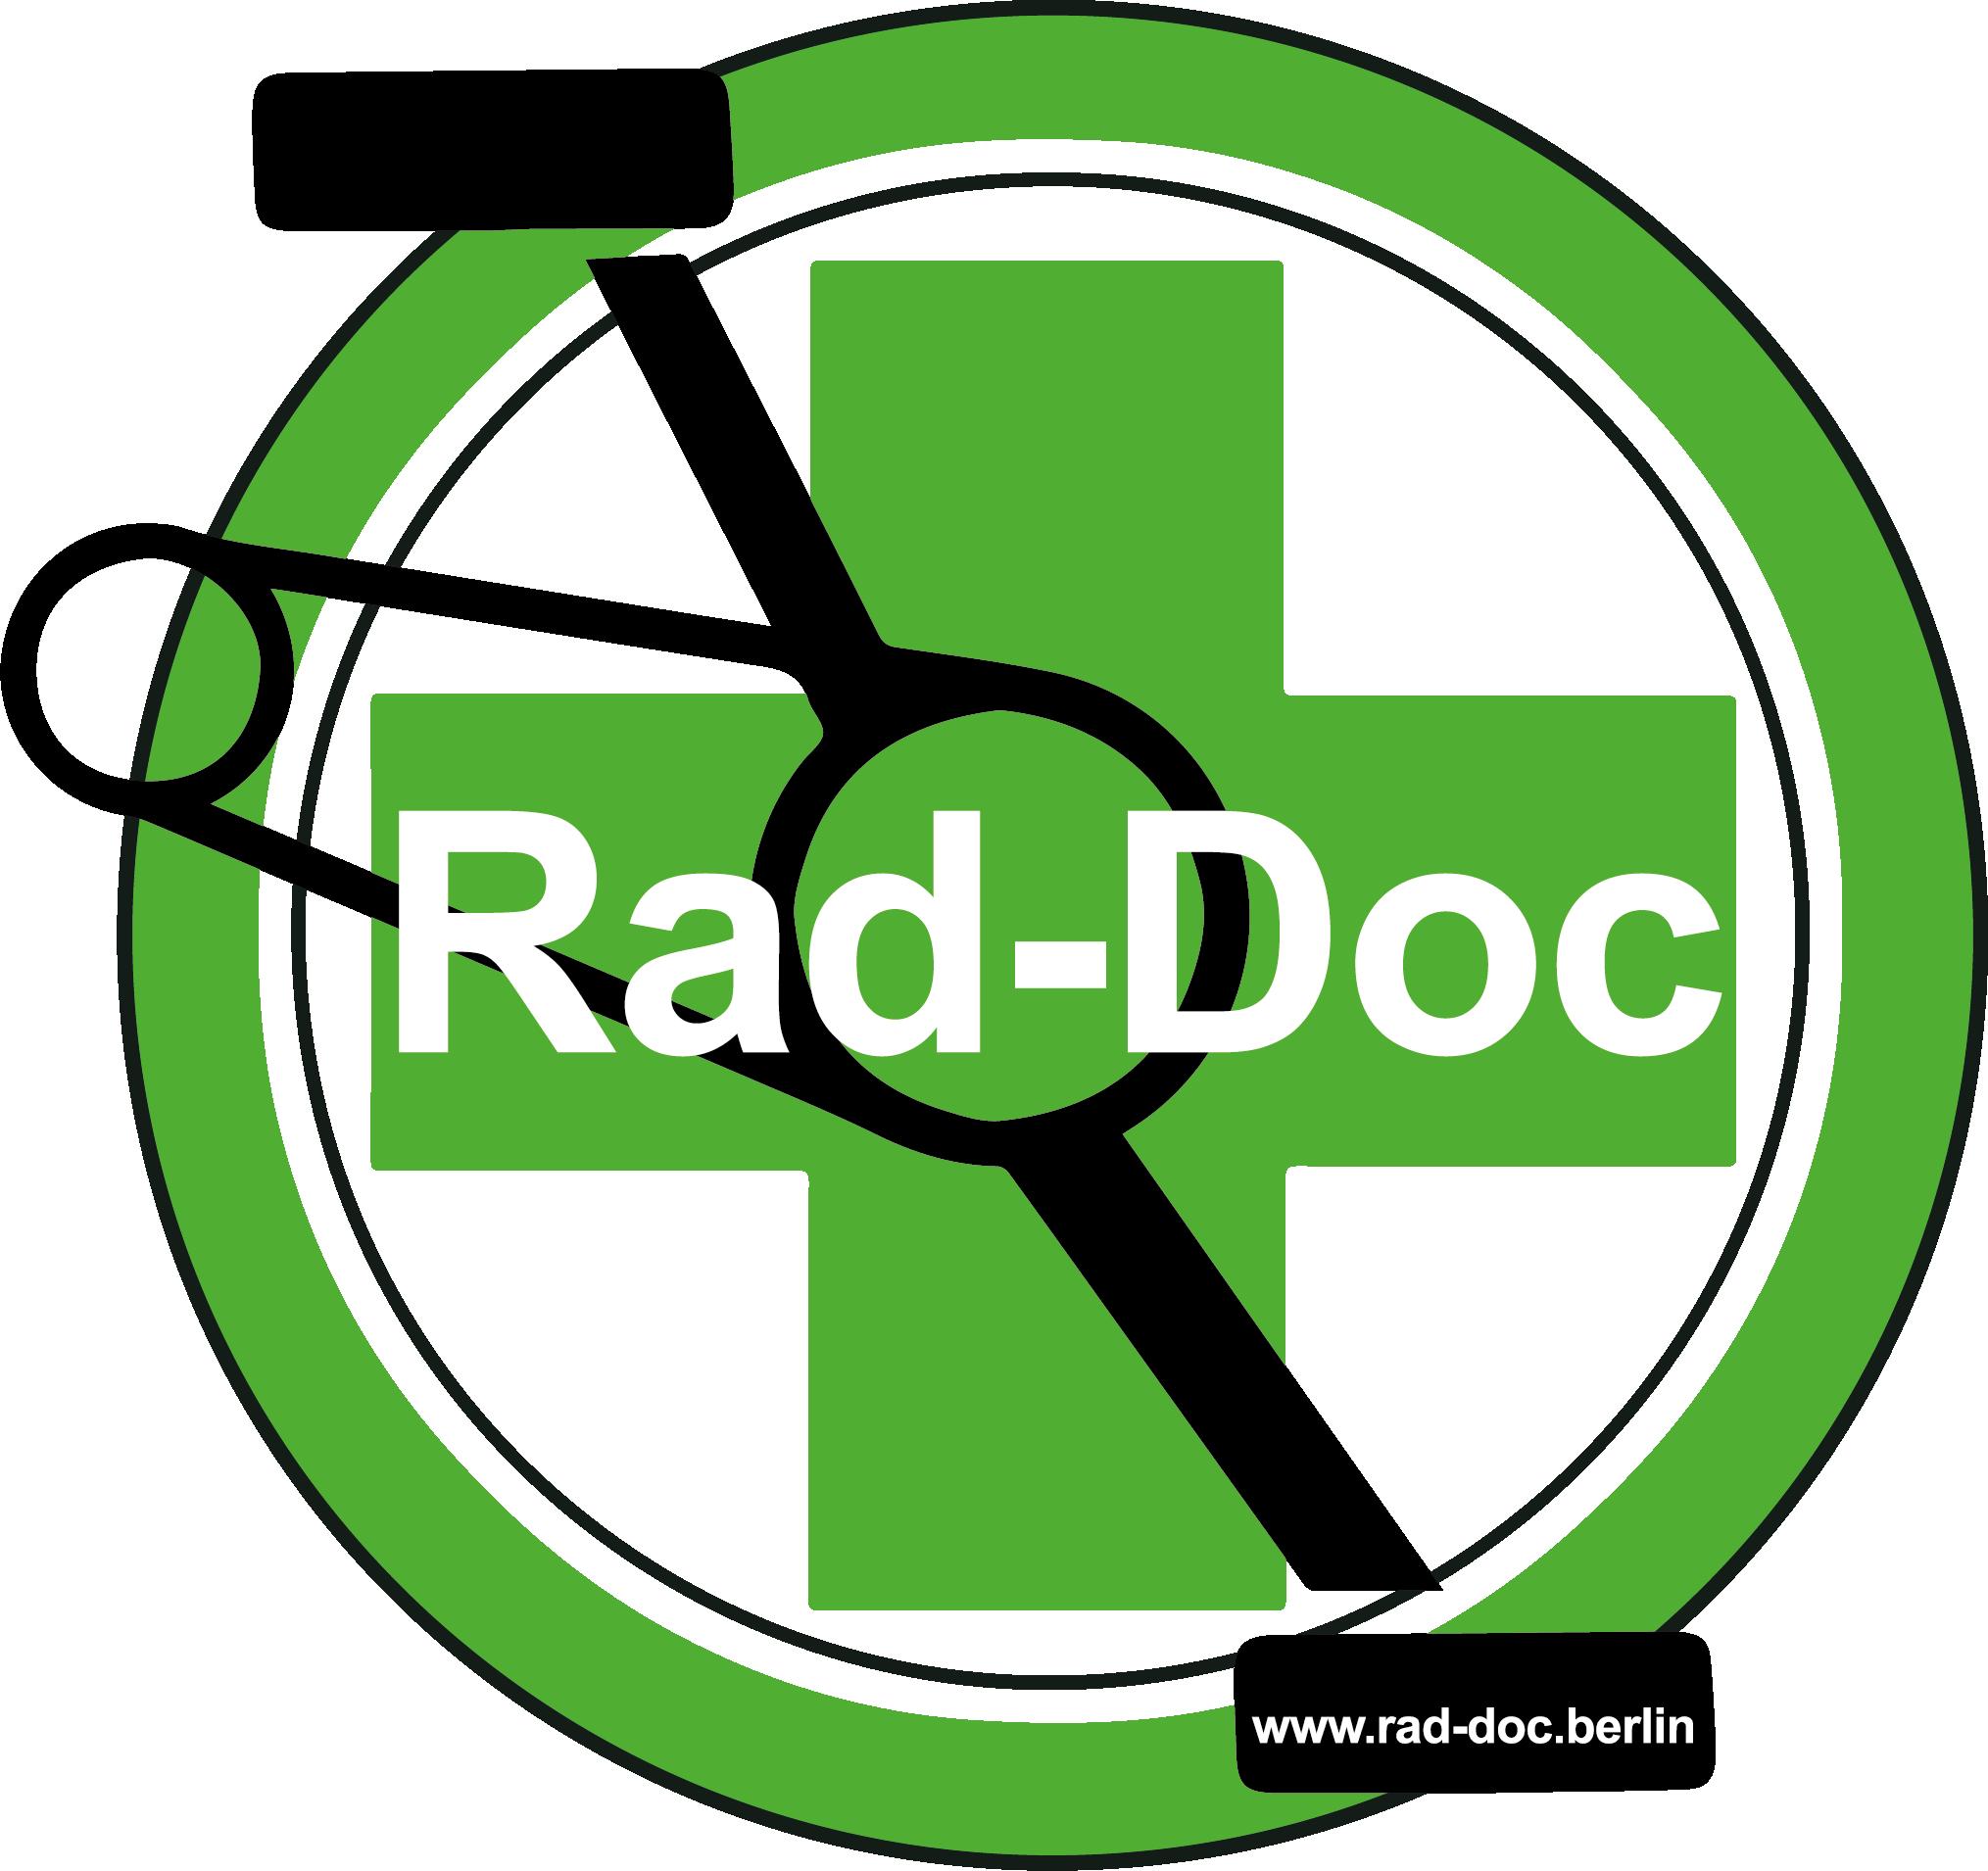 Rad-Doc